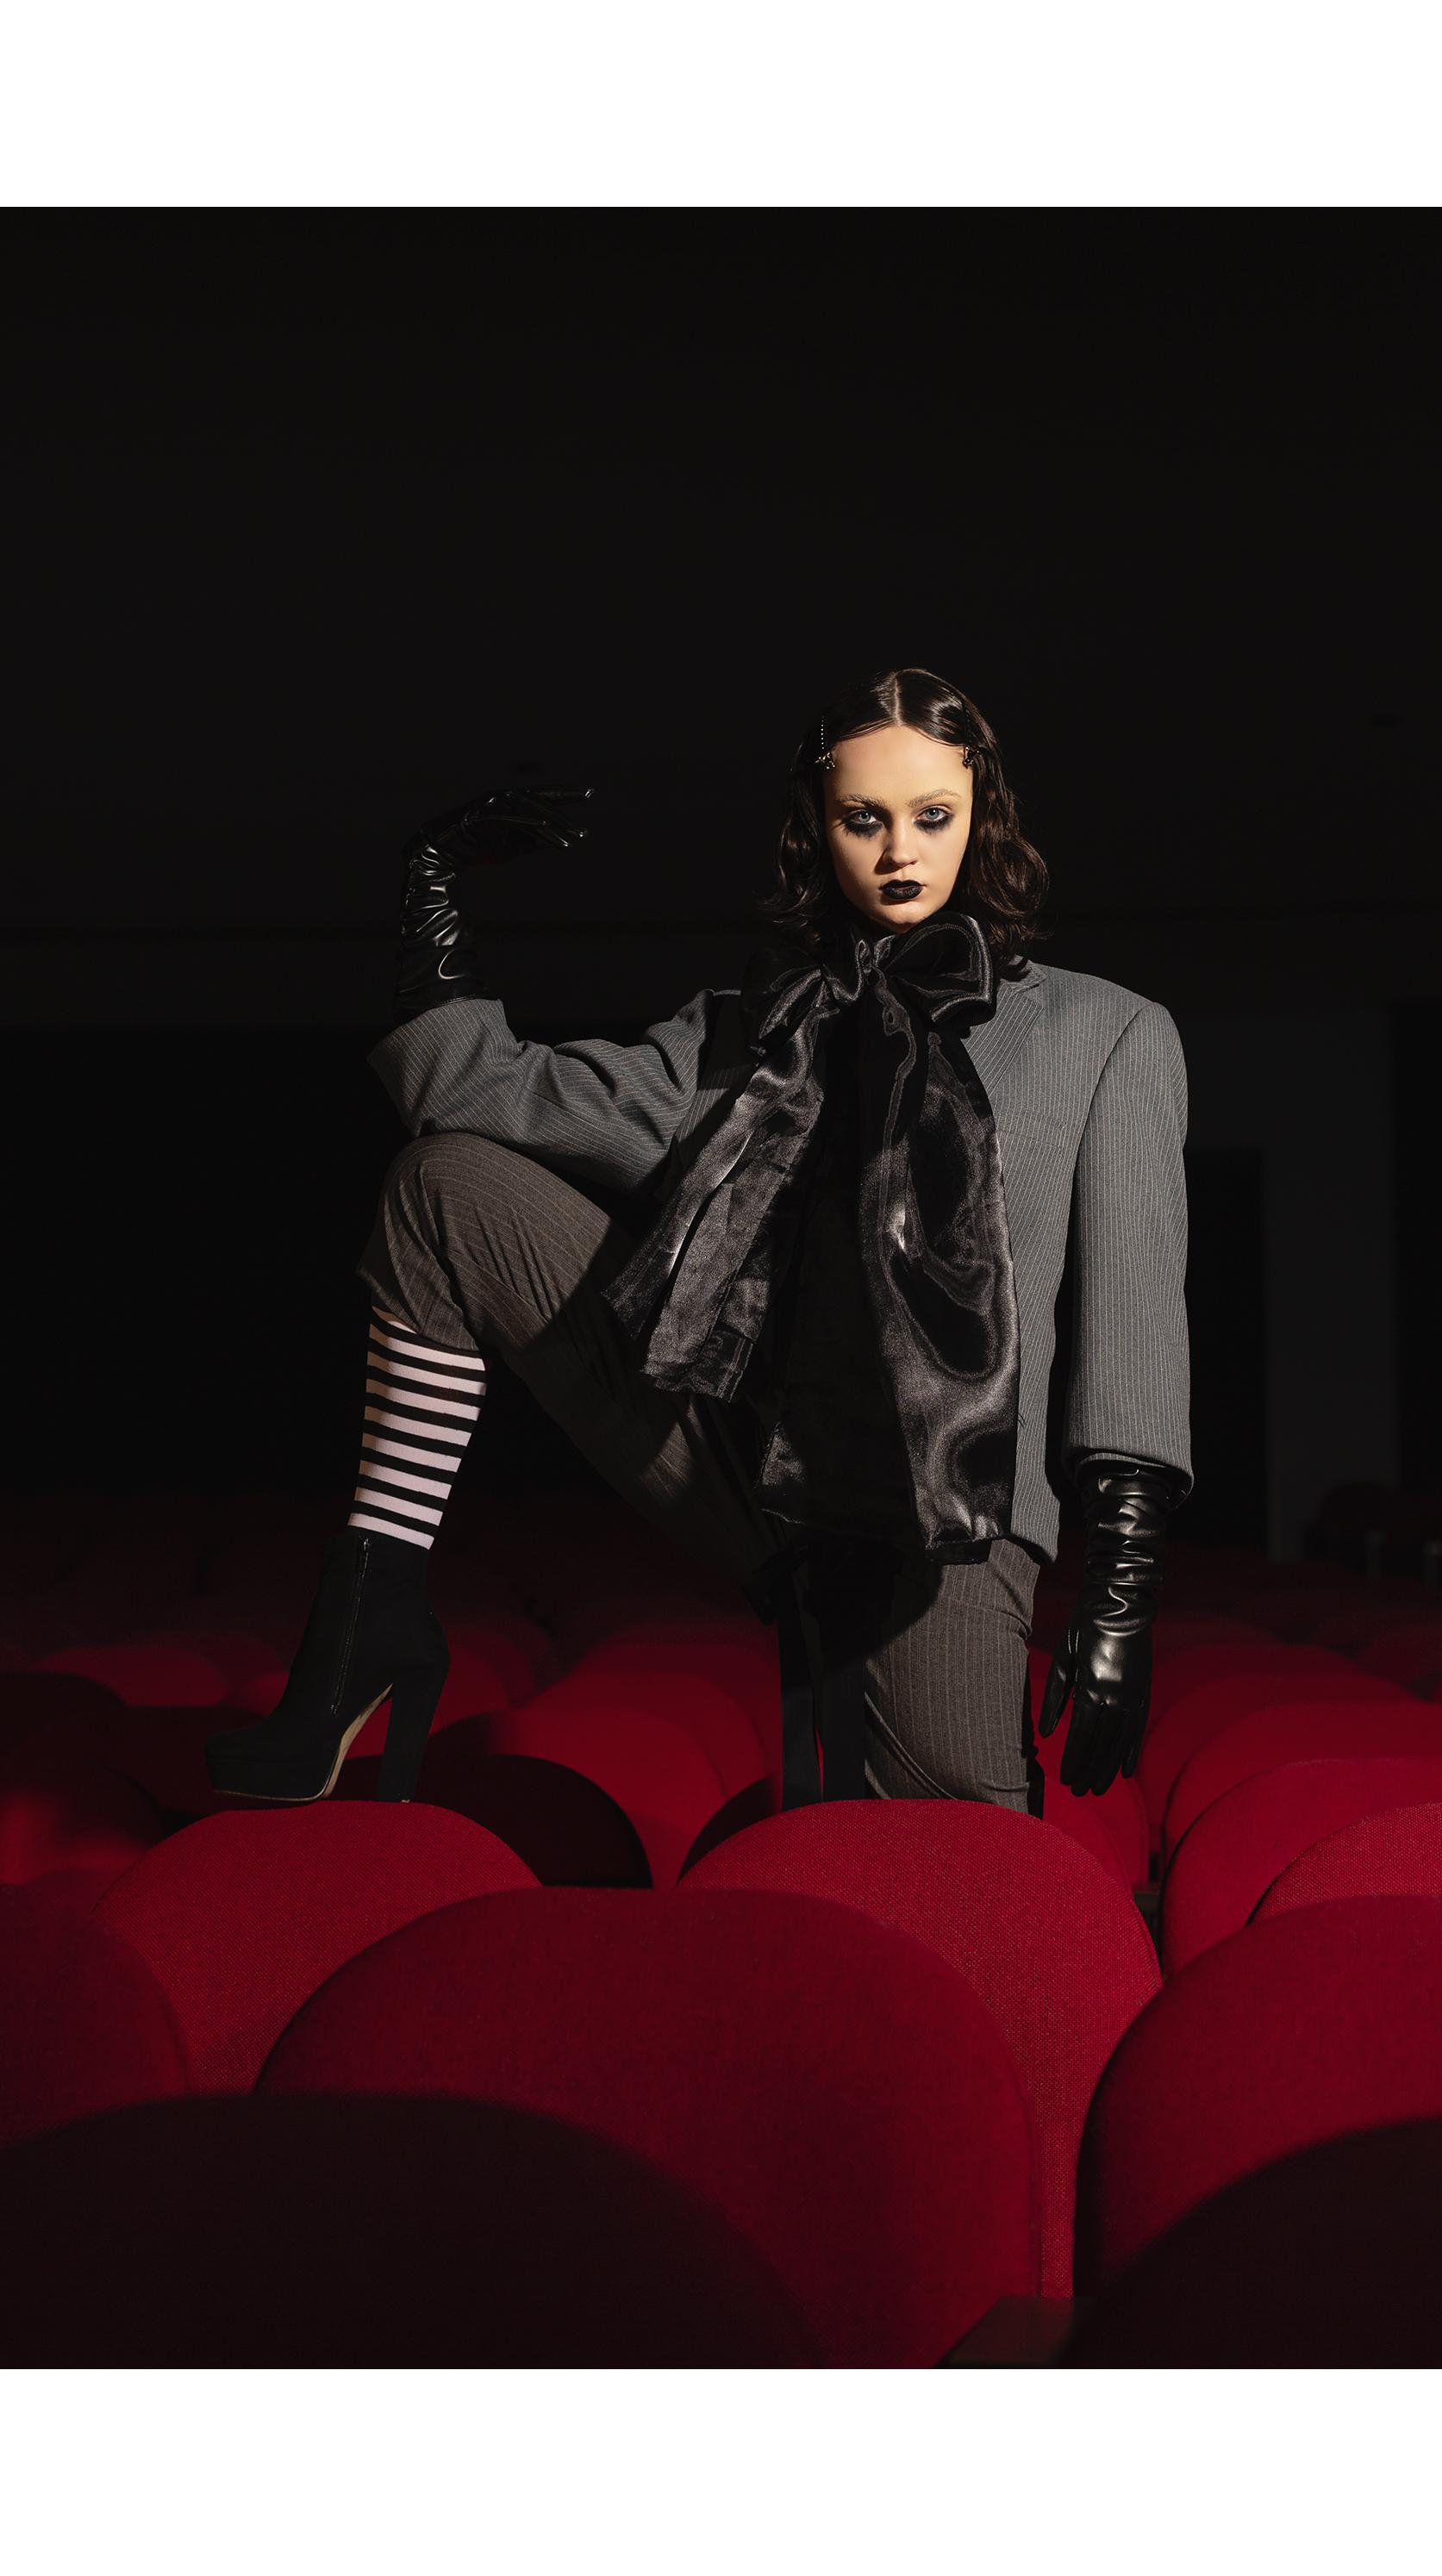 Creative Director & Stylist:  Emilie Haupt    Producer & Assistant Art Director:  Kiersten Herr  &  Hannah Brown